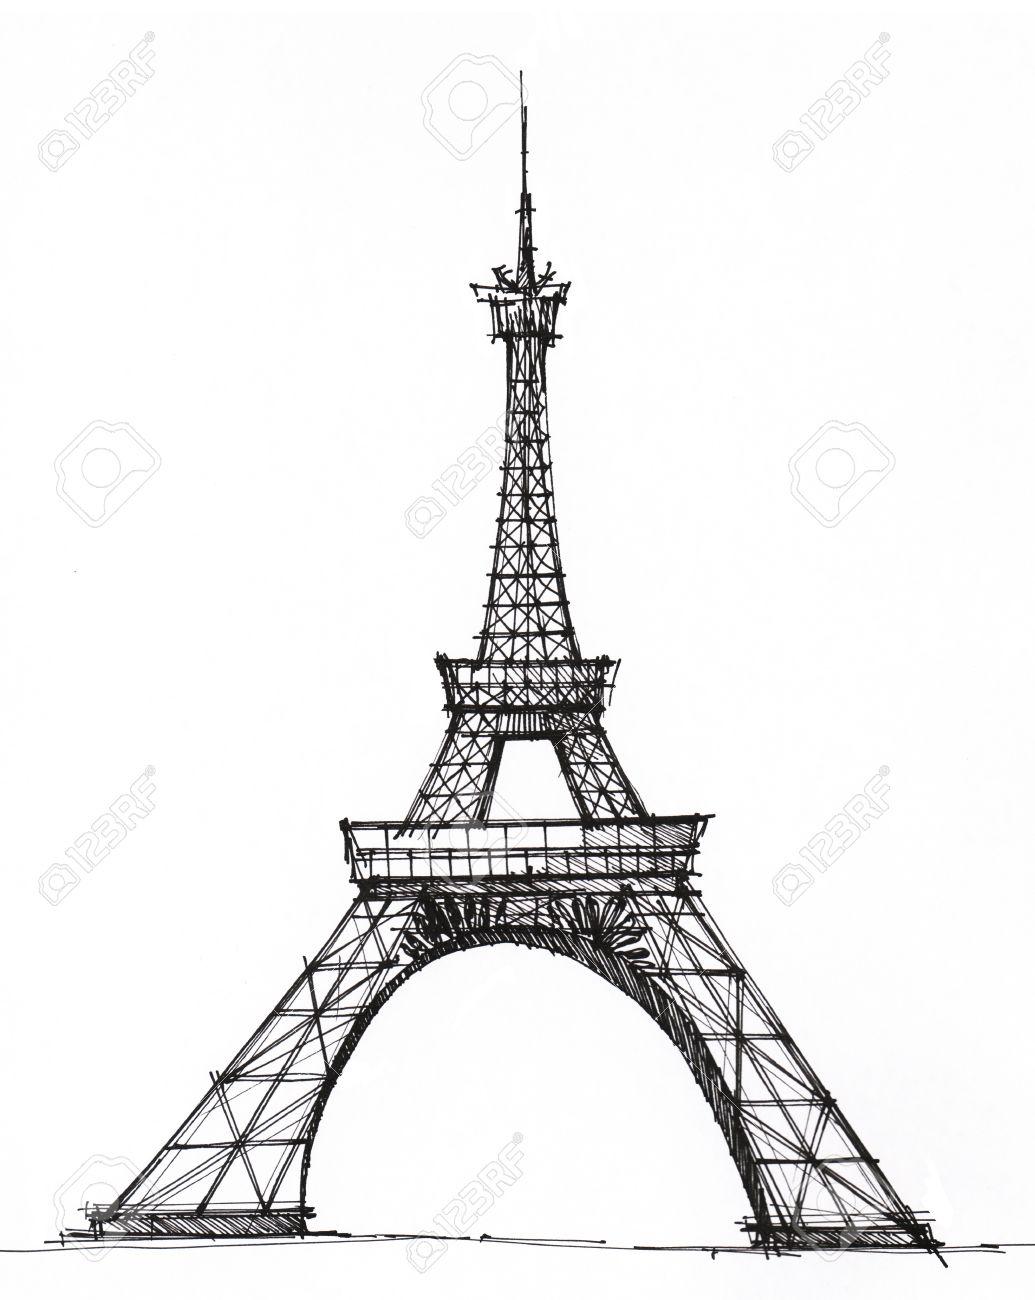 Charmant Eiffelturm Paris Druckbare Malvorlagen Fotos - Entry Level ...